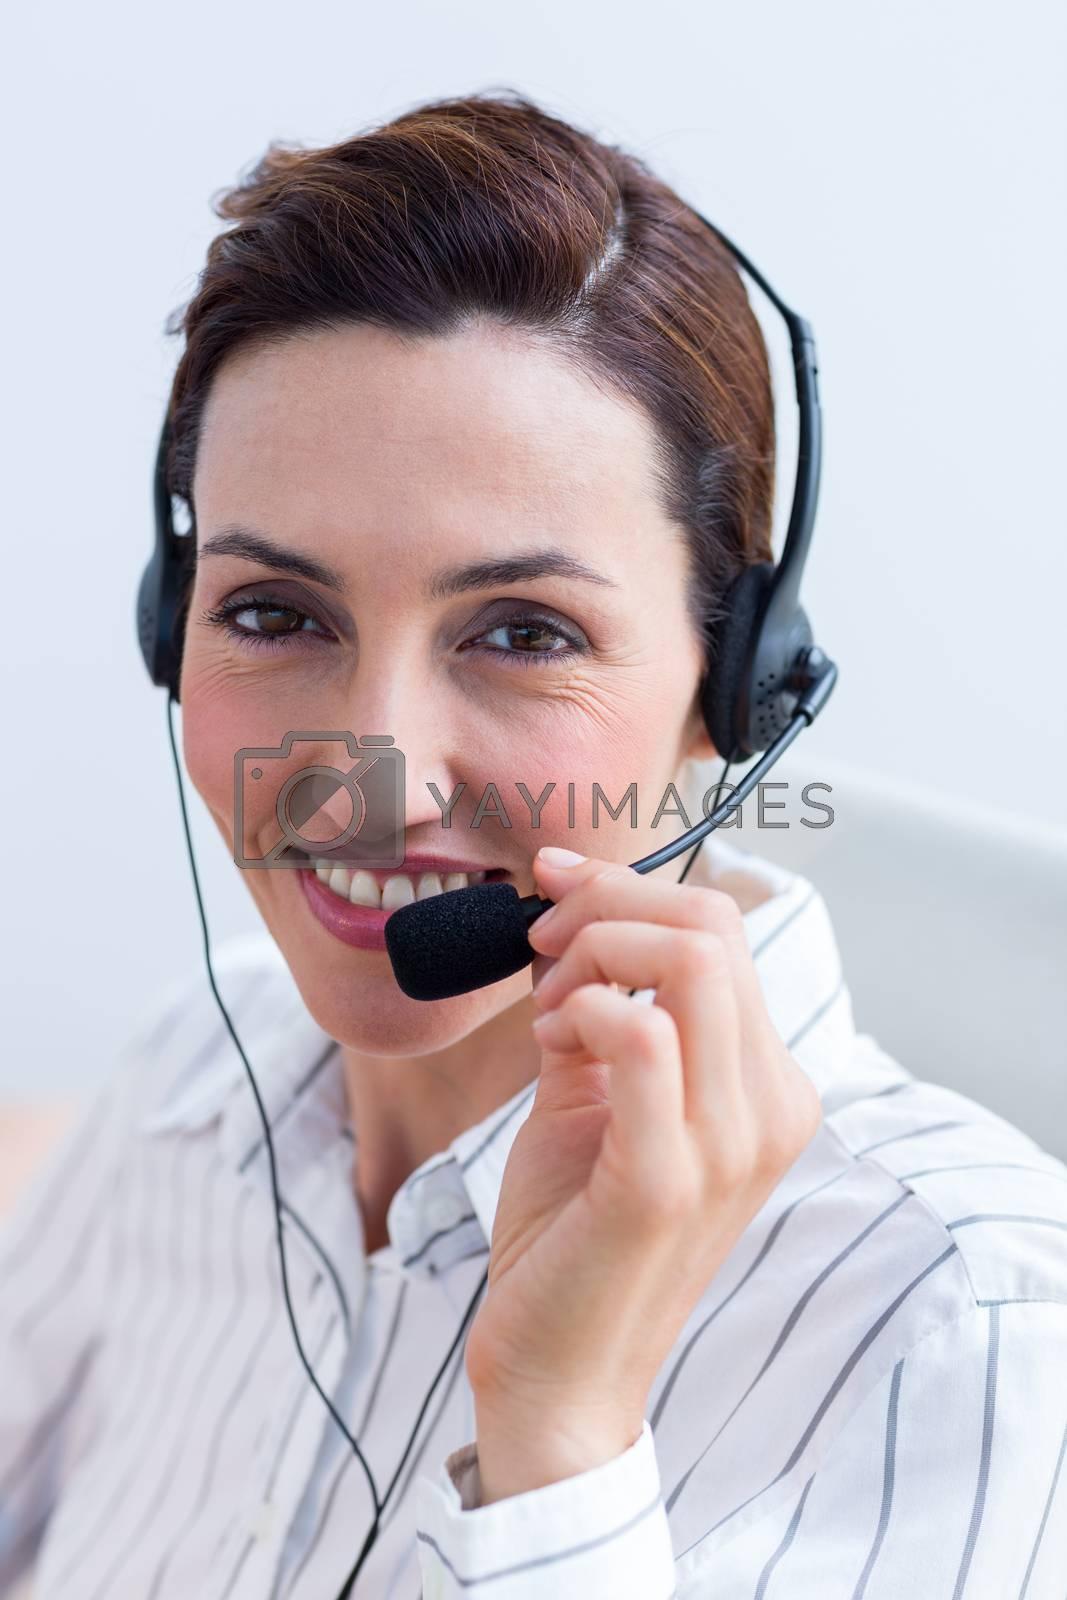 Royalty free image of Portrait brunette businesswoman smiling using headphone by Wavebreakmedia